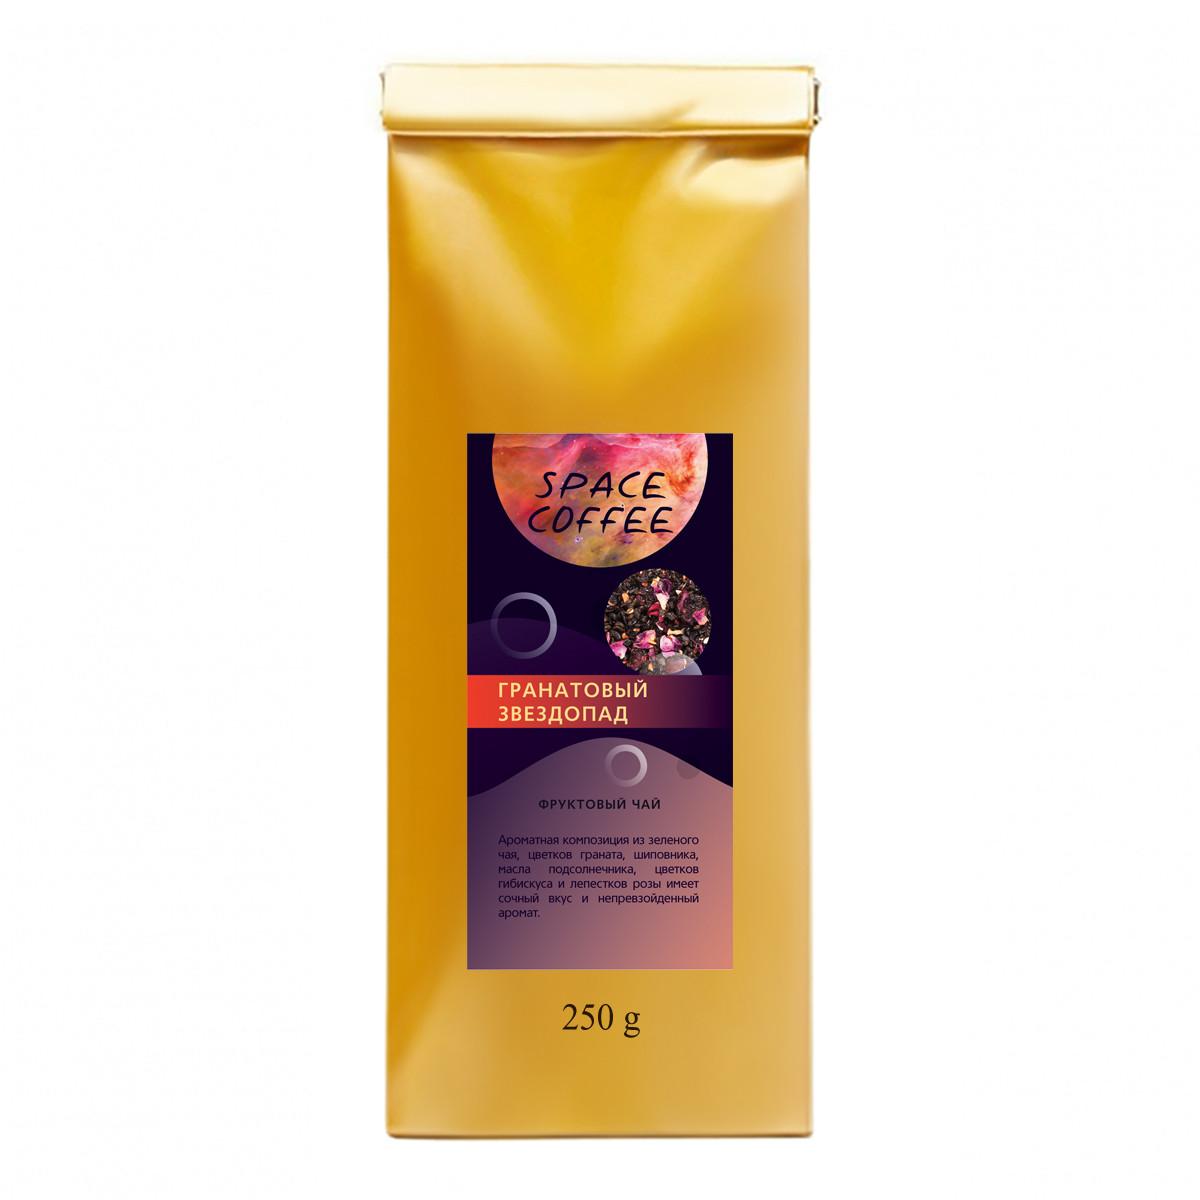 Зеленый чай с гранатом, каркаде и лепестками роз Гранатовый звездопад Space Coffee 250 грамм